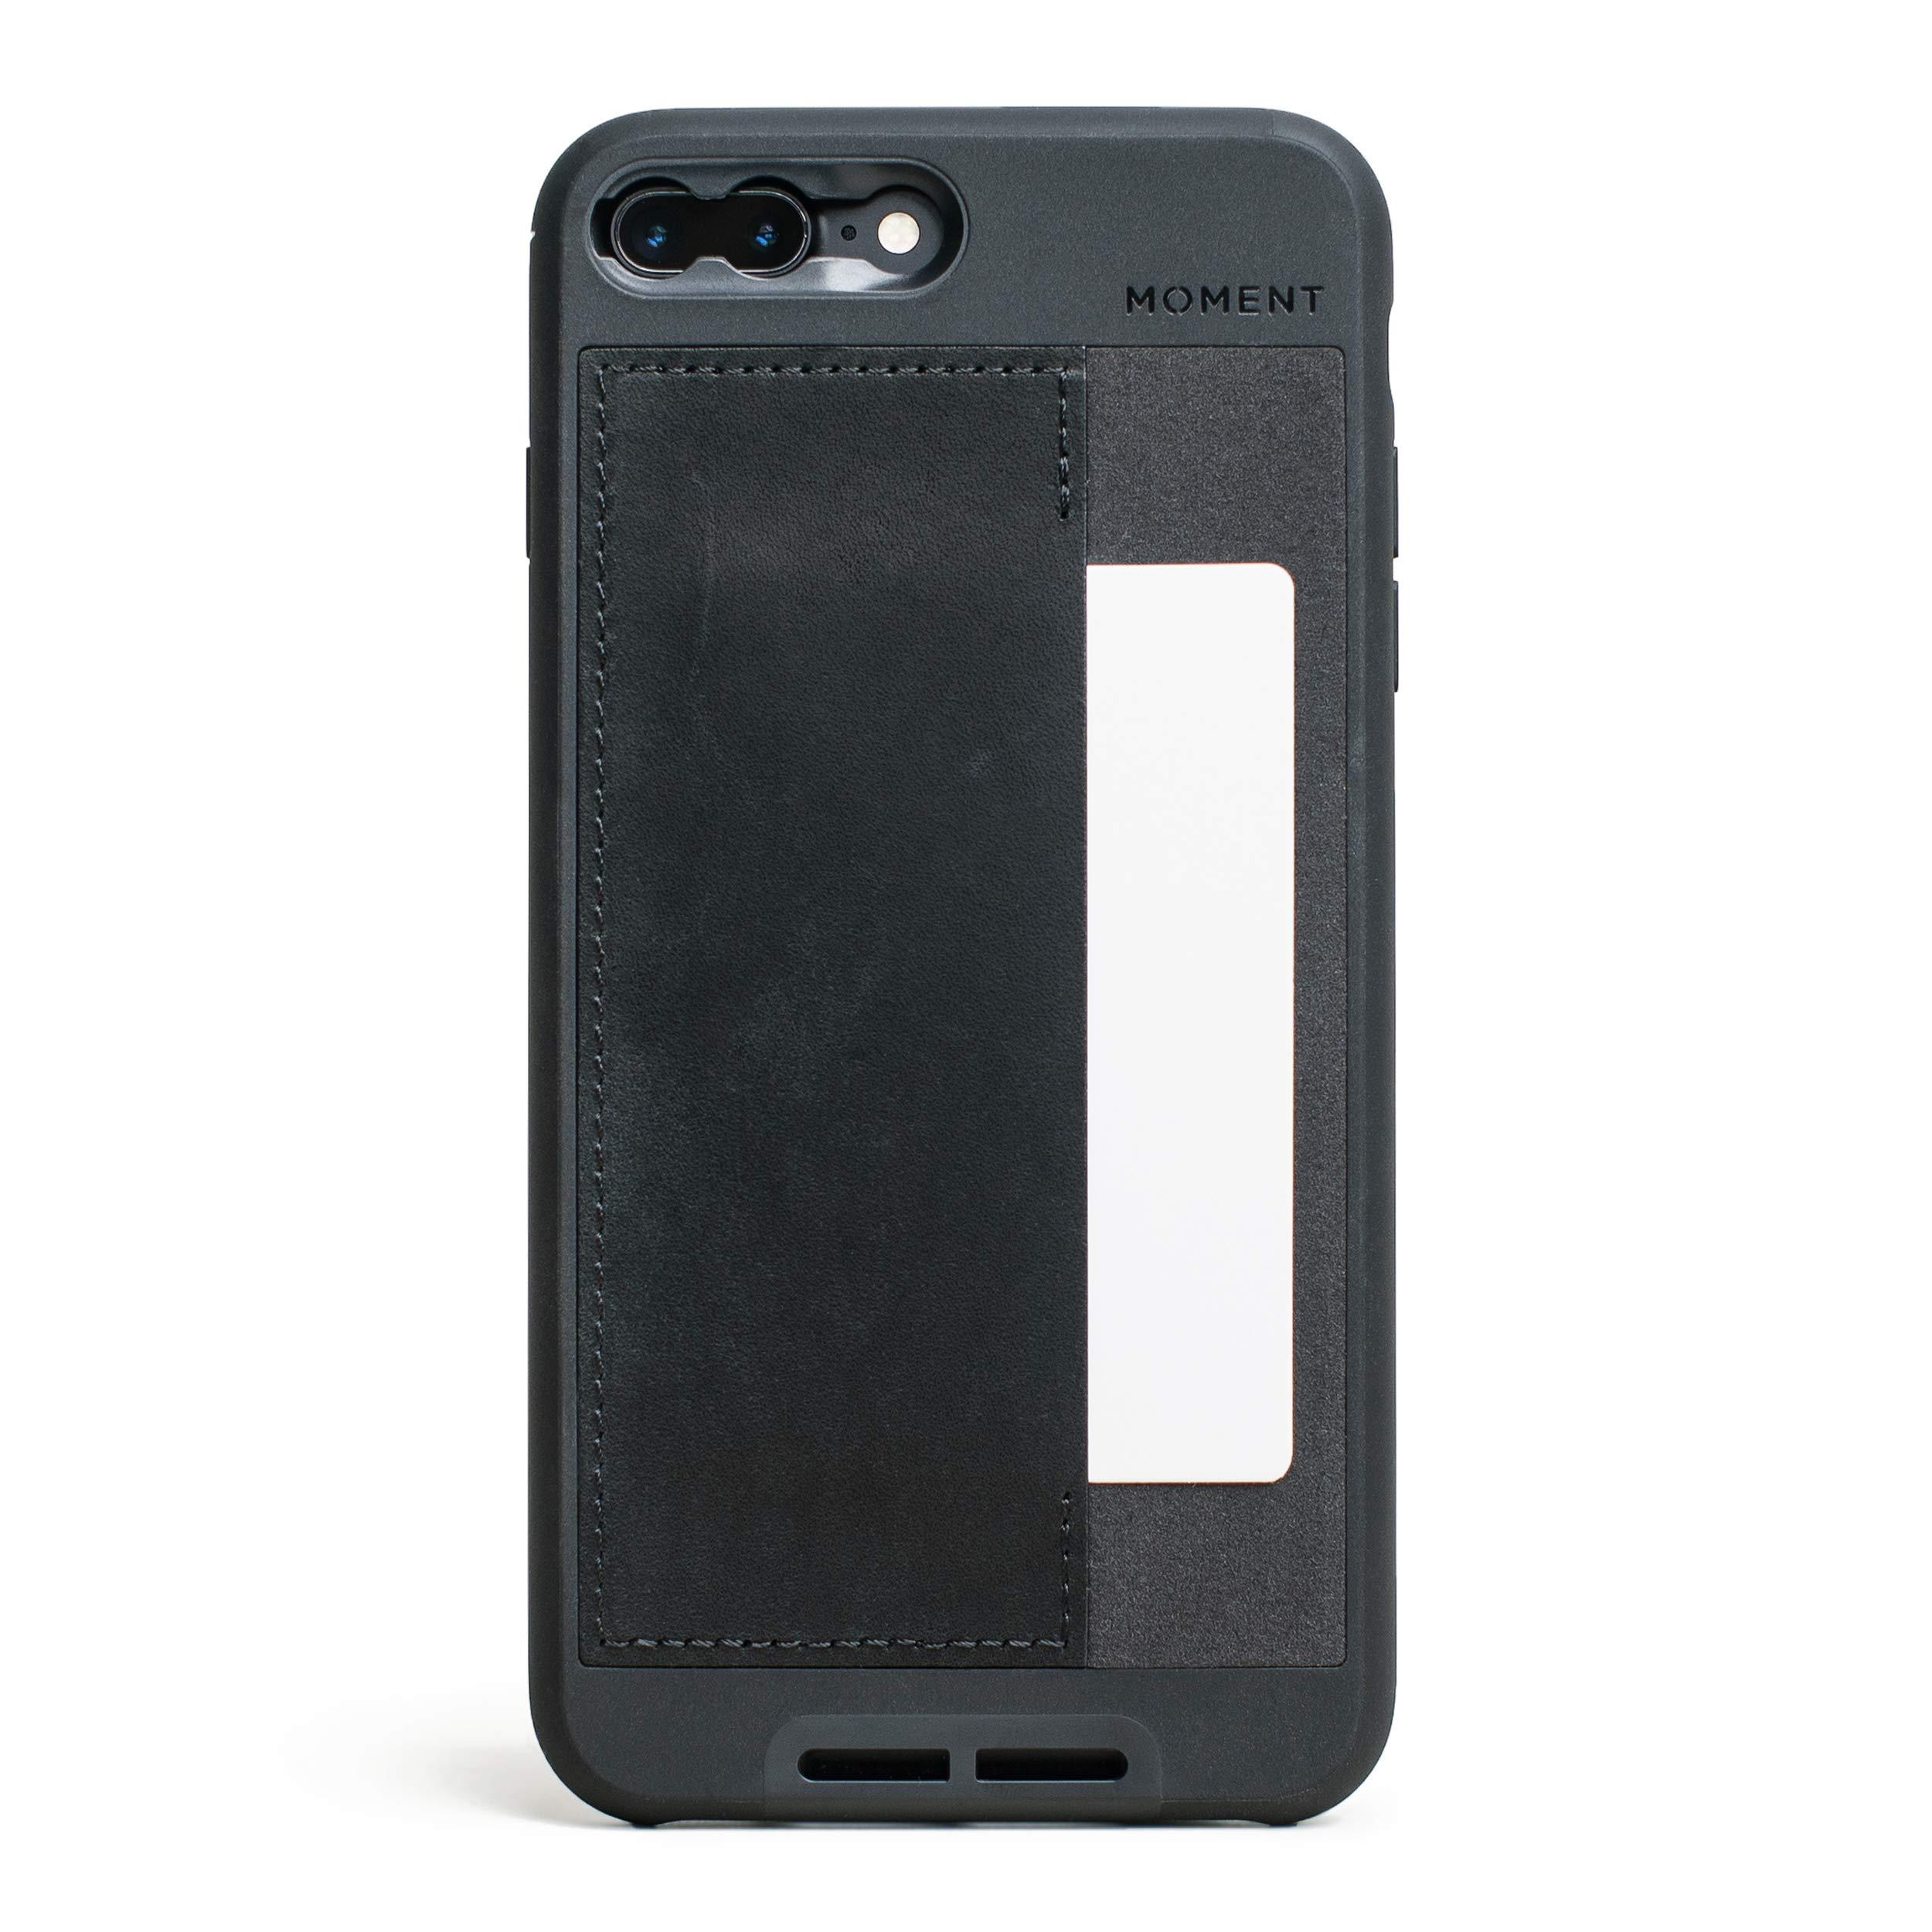 ویکالا · خرید  اصل اورجینال · خرید از آمازون · iPhone 7 Plus / 8 Plus Wallet Case || Moment Photo Case in Black Leather - Thin, Protective, Wrist Strap Friendly Wallet case for Camera Lovers. wekala · ویکالا